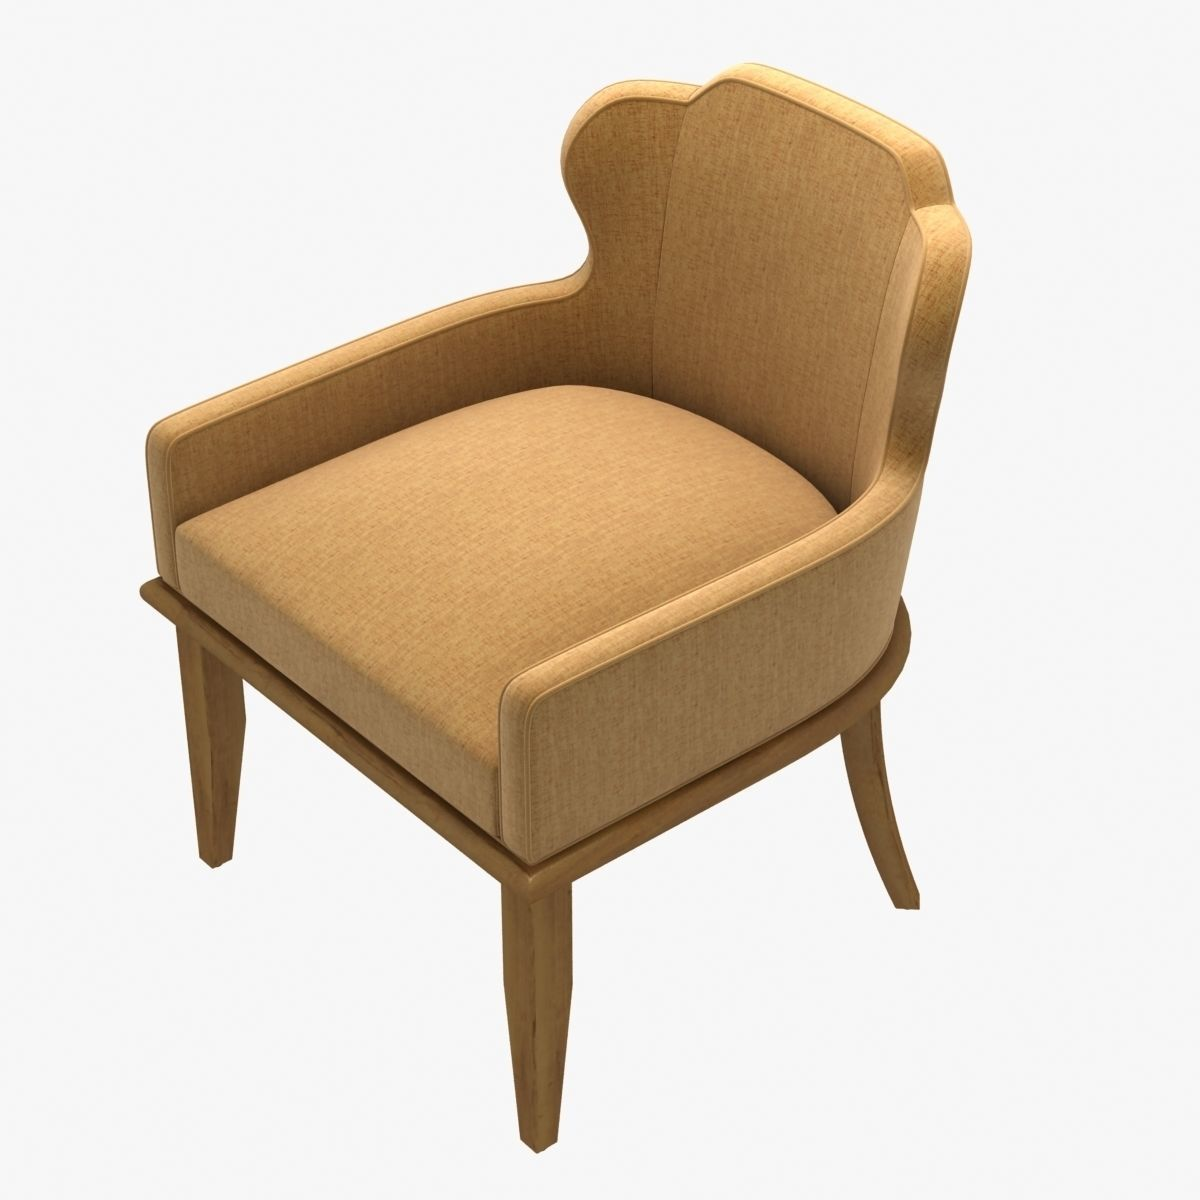 Beau ... Charter Furniture Halsey Occasional Lounge Chair 3d Model Max Obj 3ds  Fbx Stl Mtl 4 ...